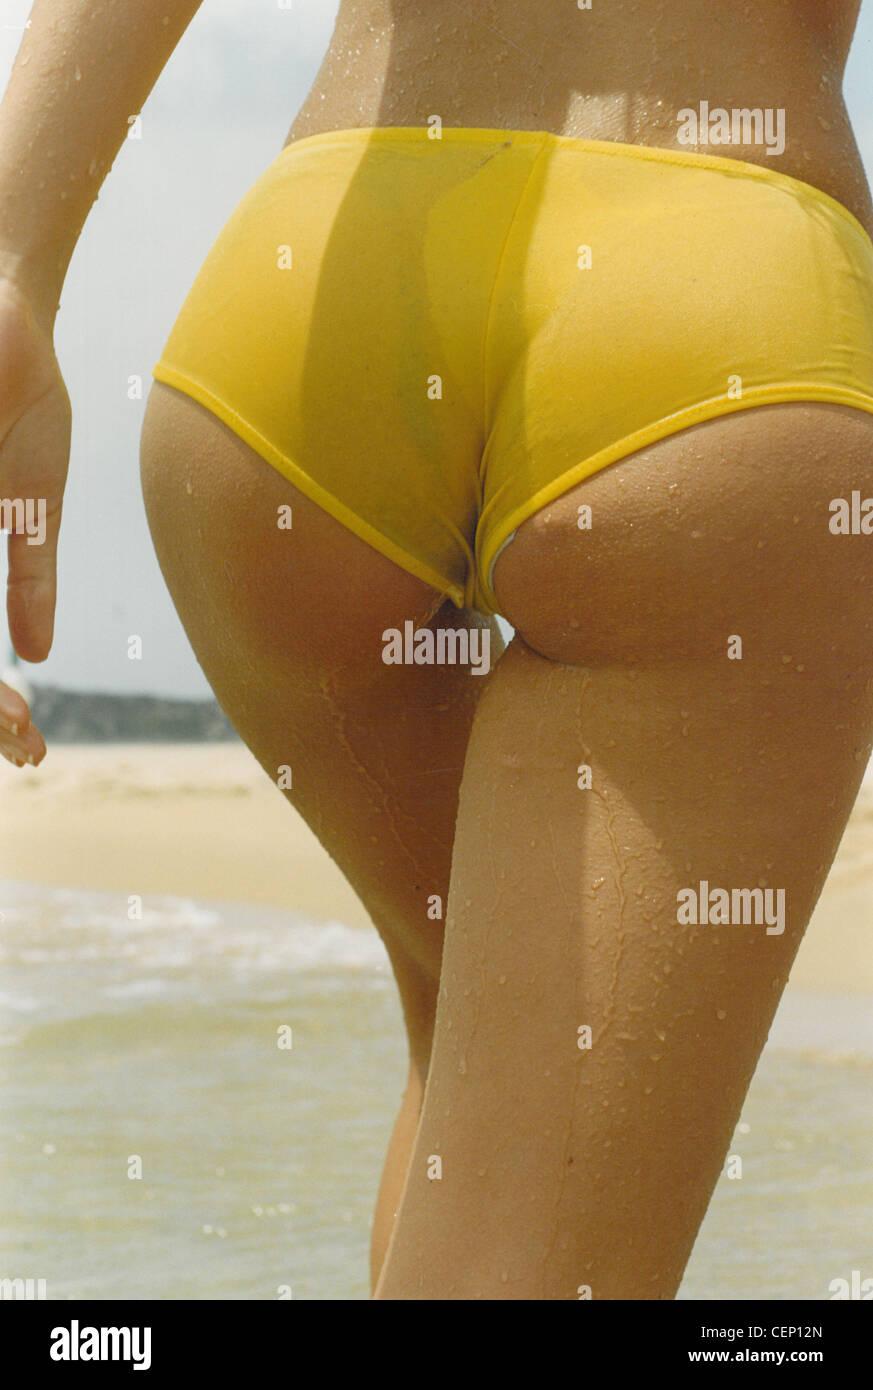 Female wearing yellow bikini bottoms walking on beach Stock Photo